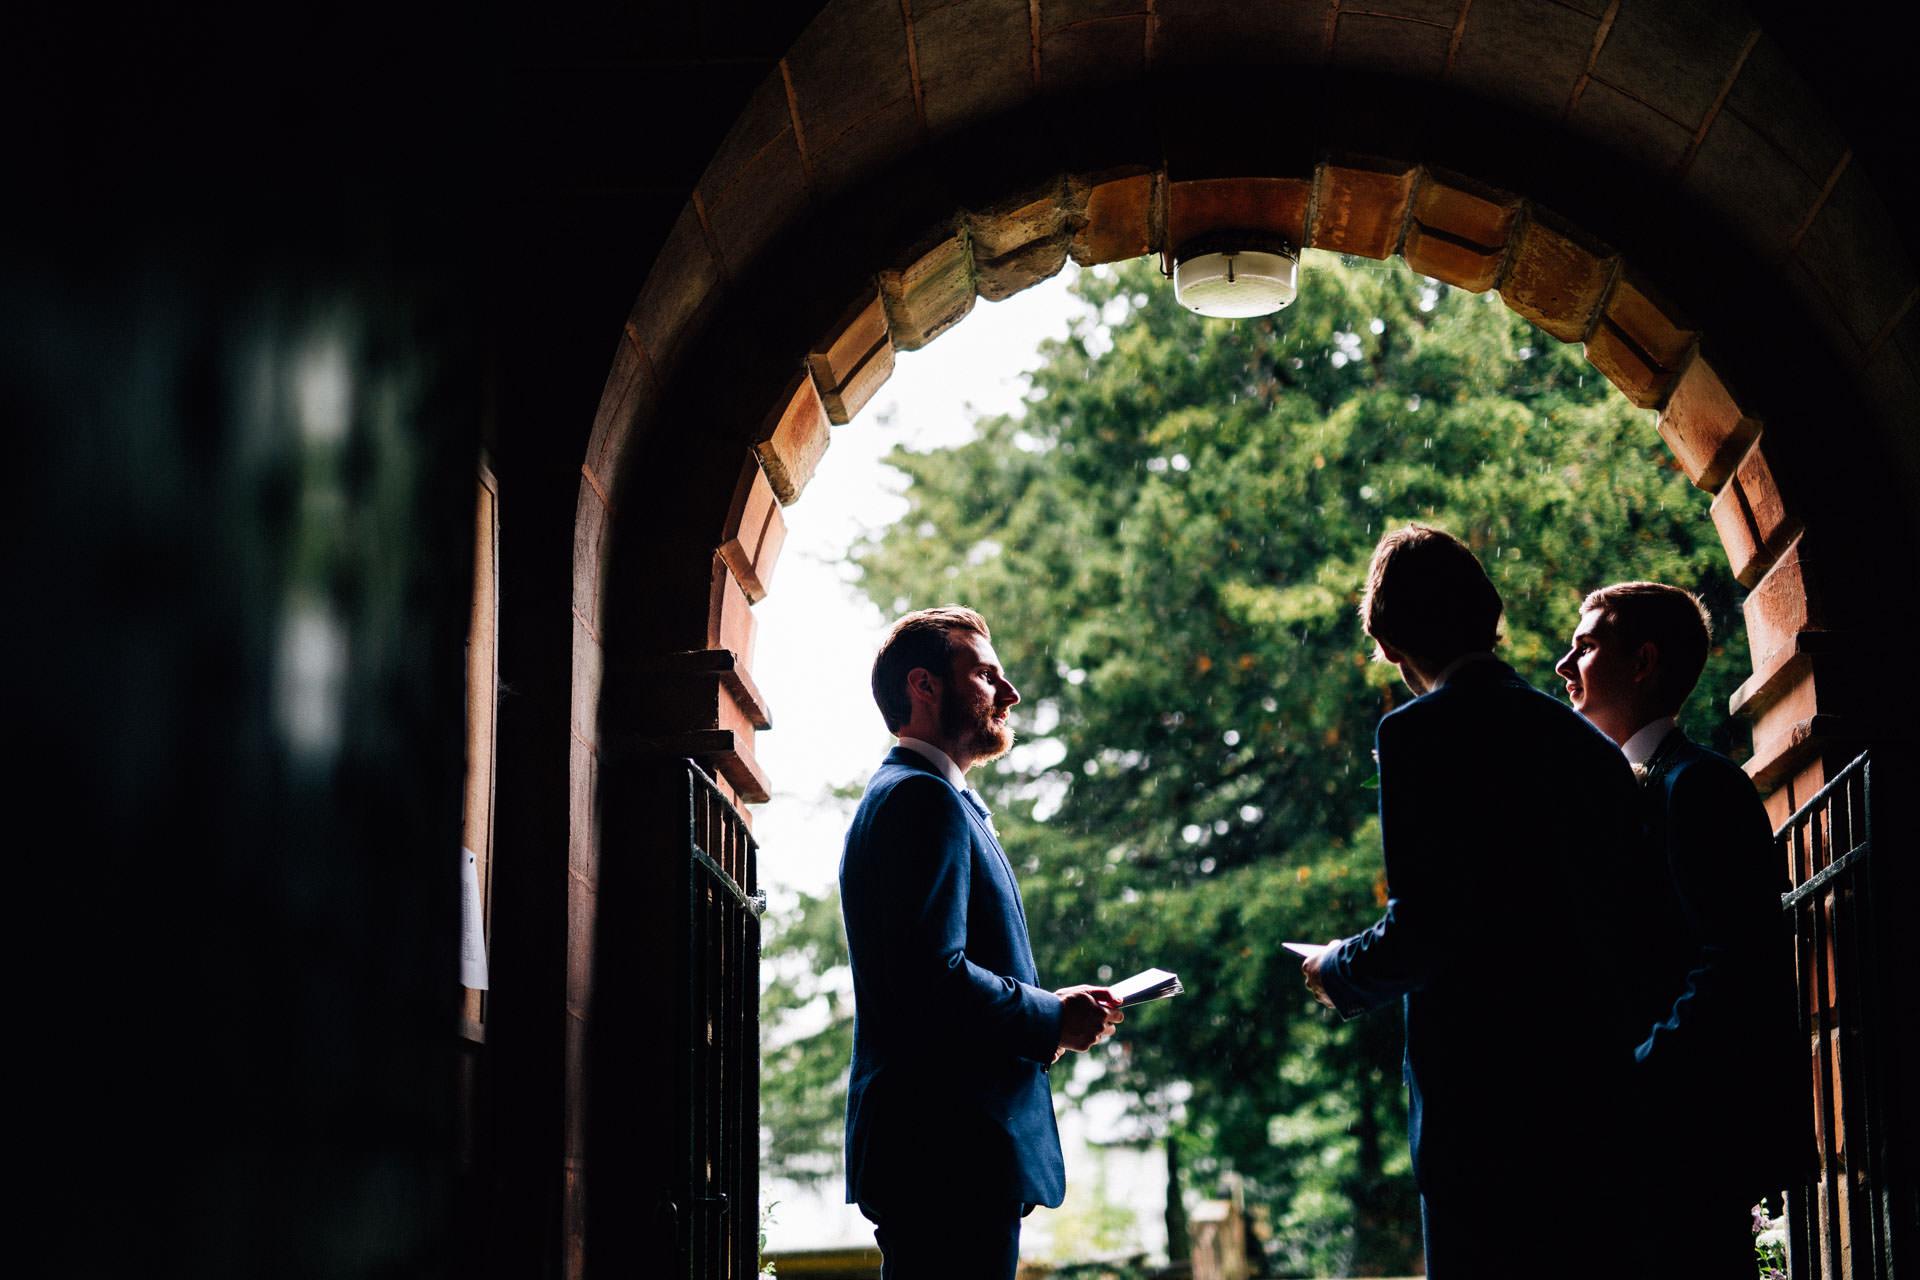 cheshire-rustic-farm-wedding-photography-helen-simon-32